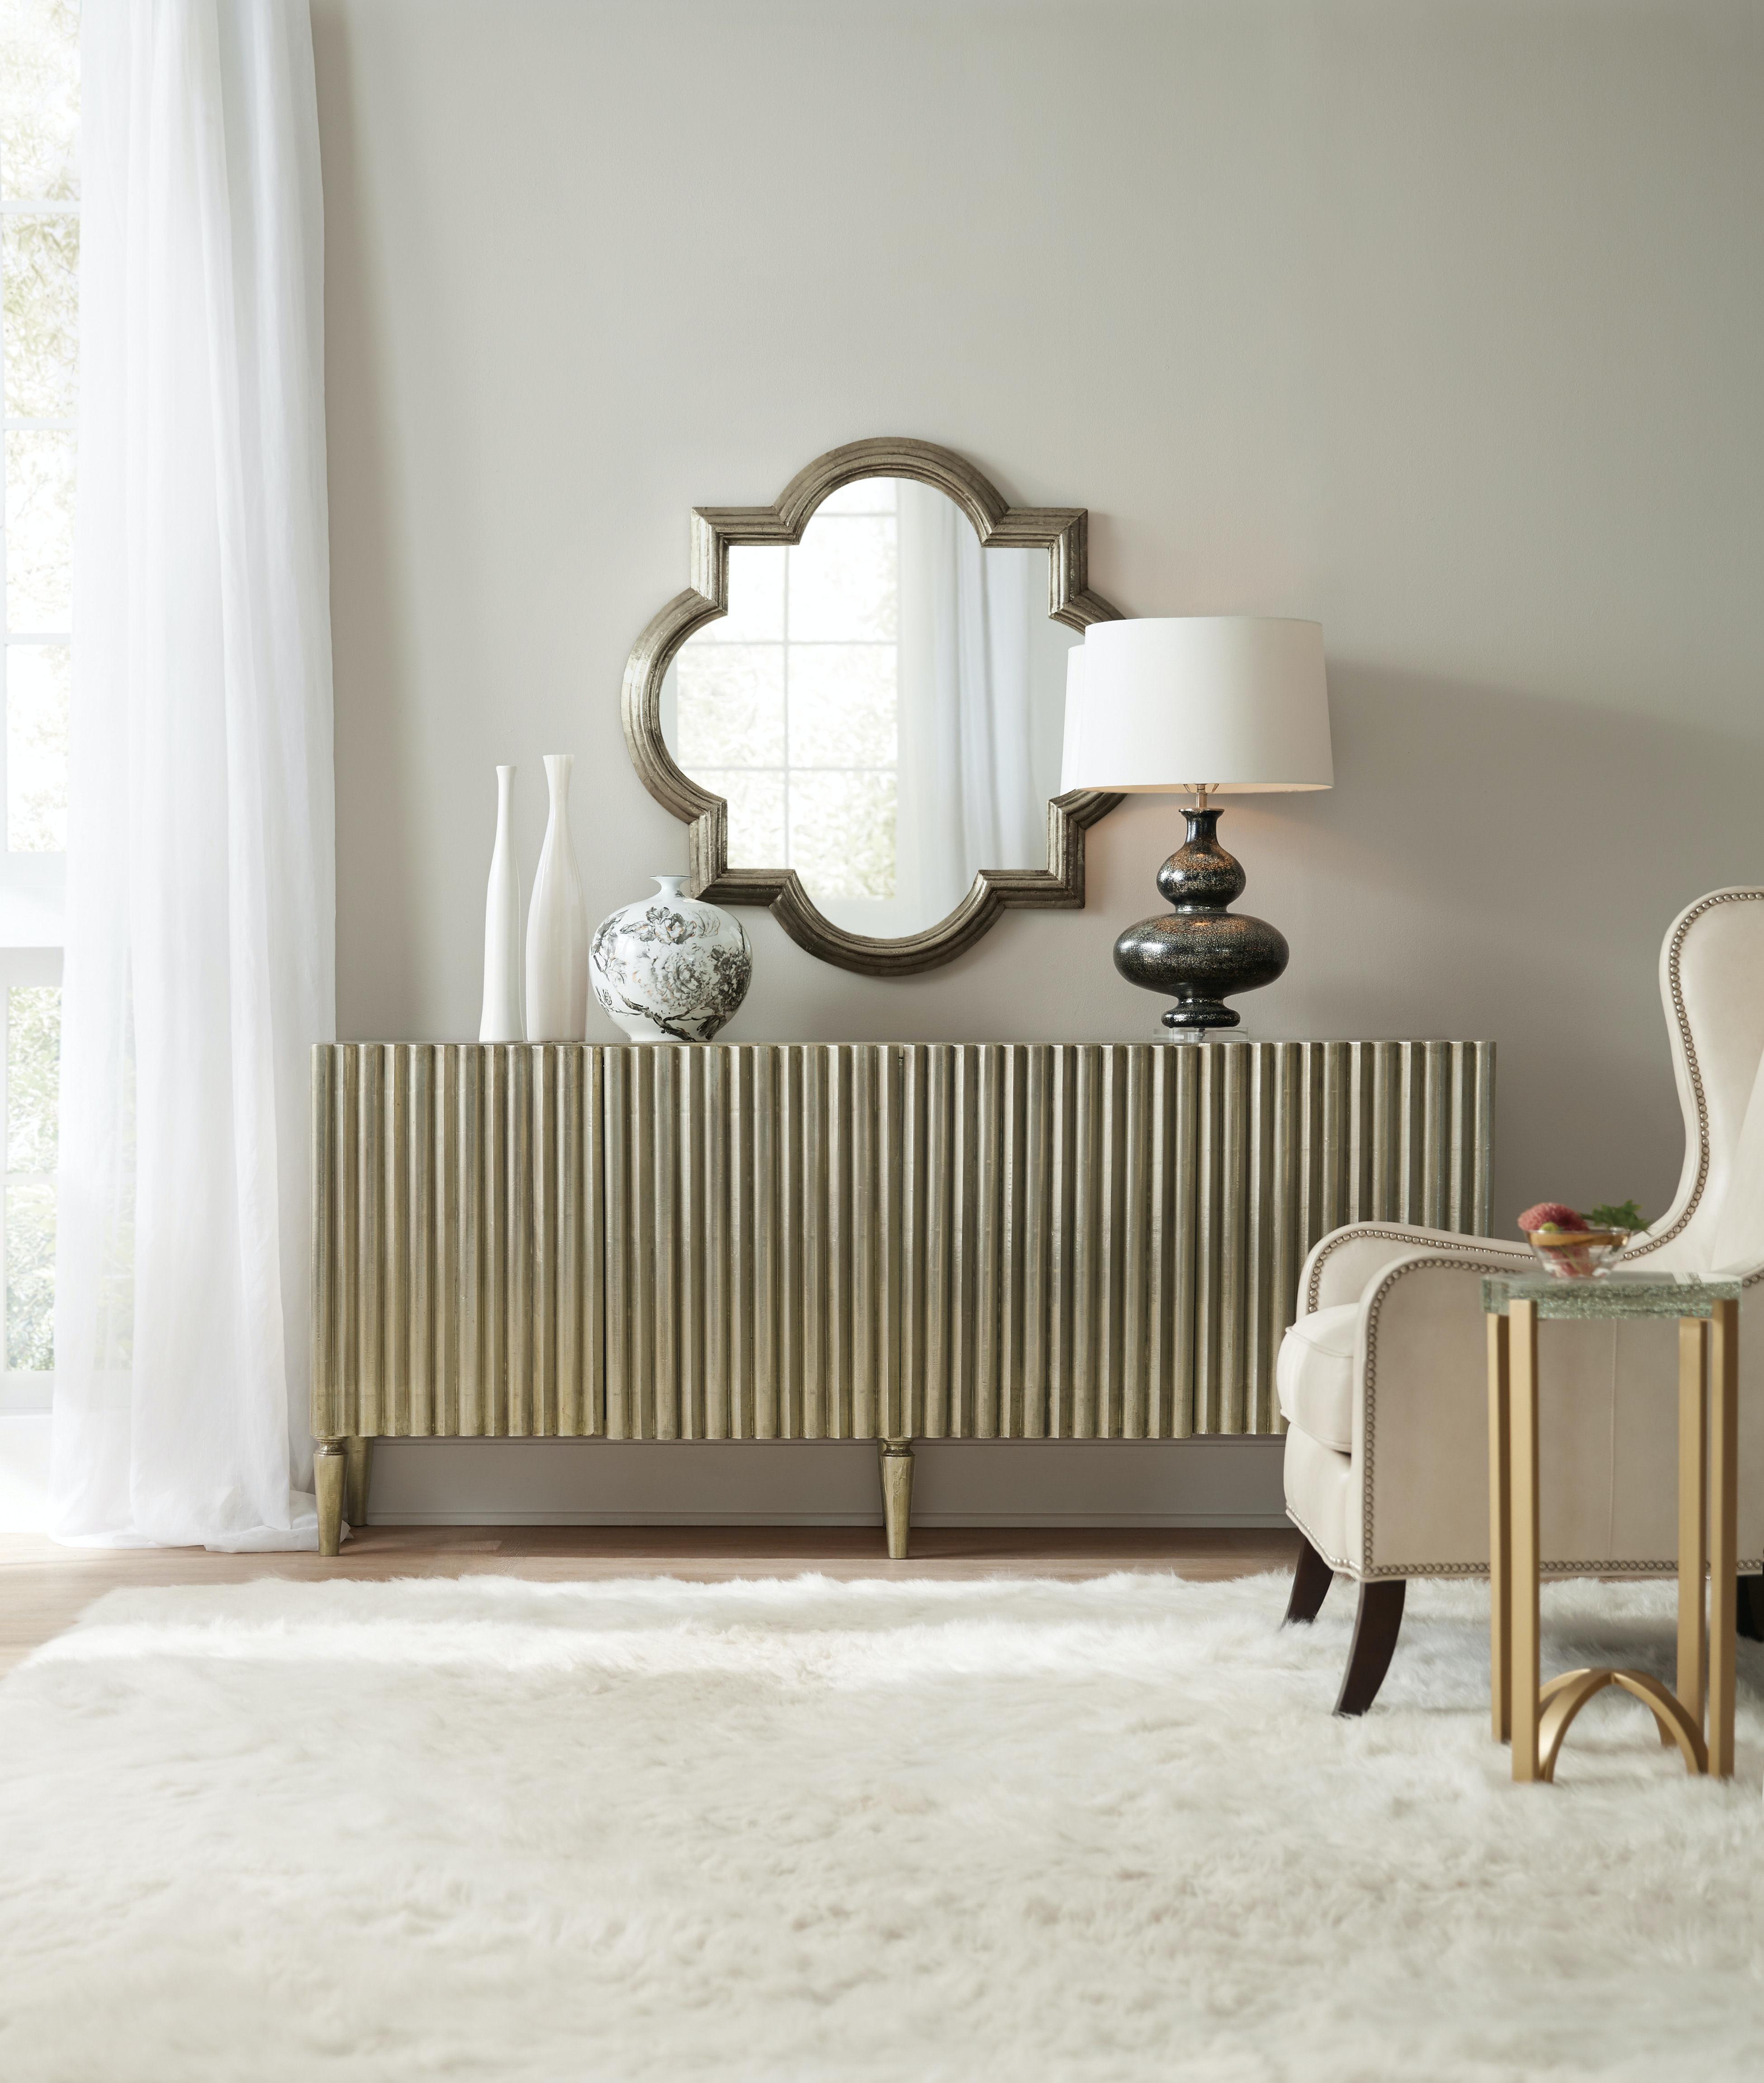 Hooker Furniture Living Room German Silver Console 5637-85001-SLV